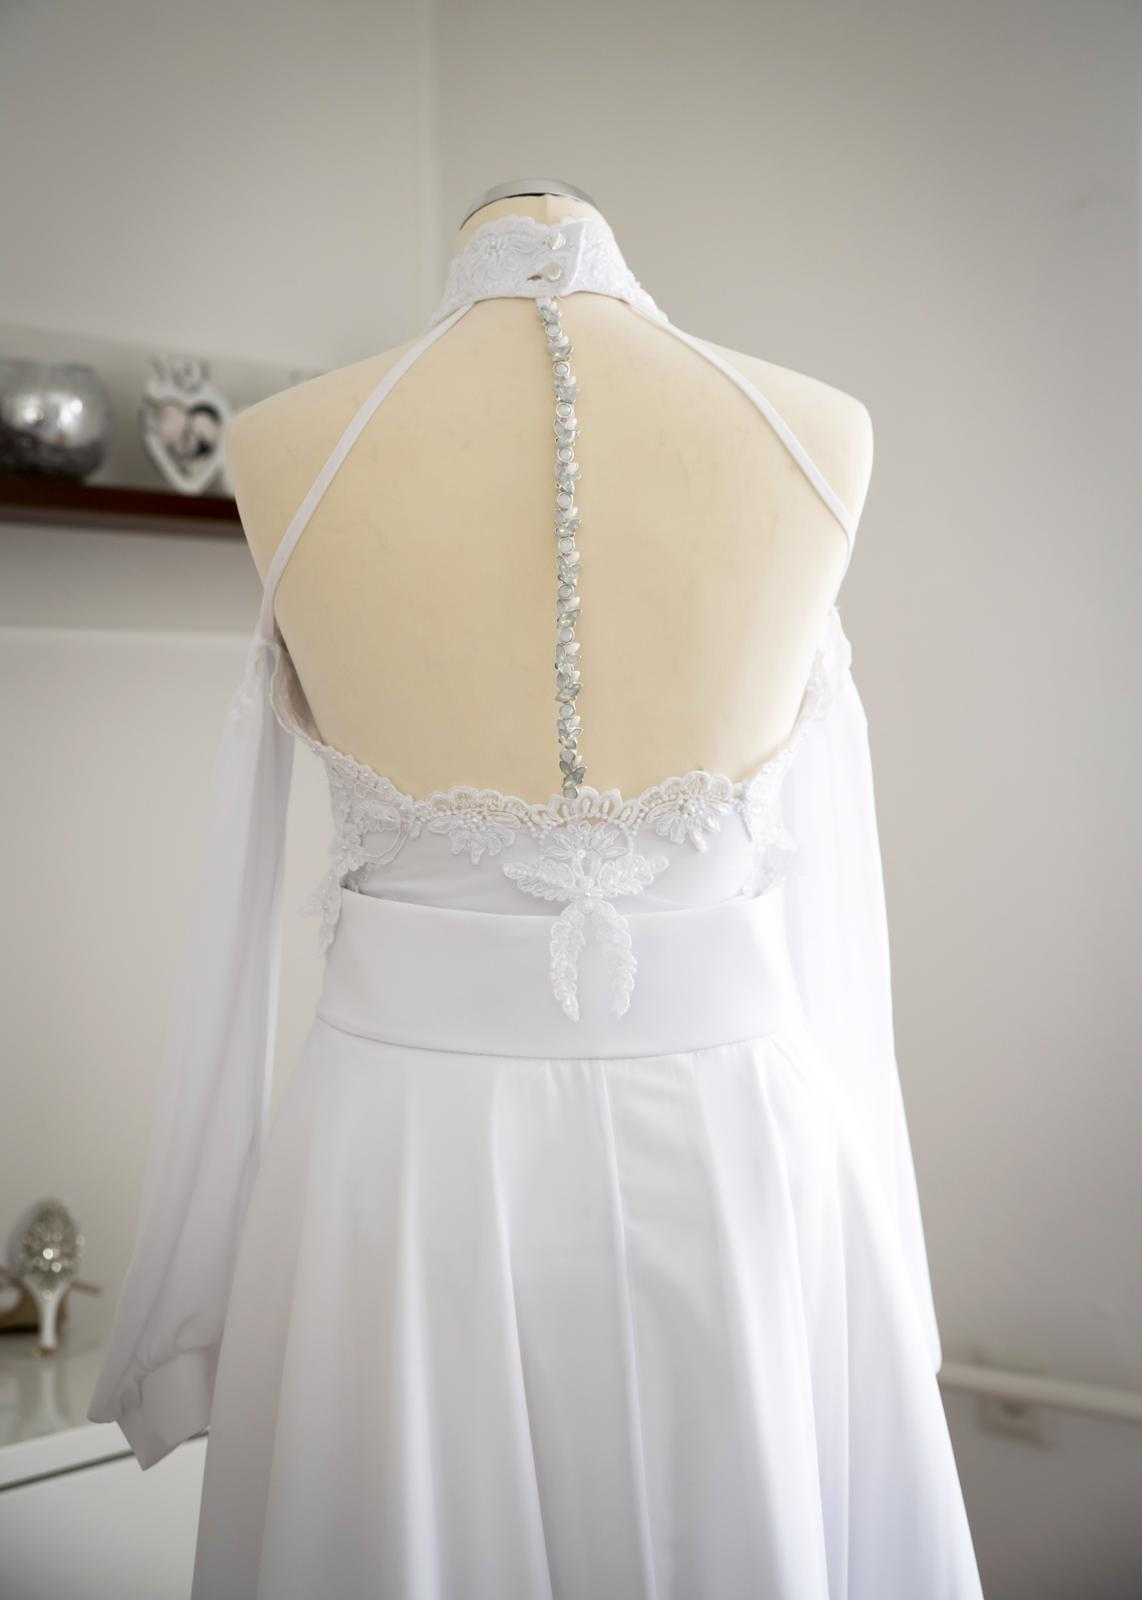 Svadobné šaty s vlečkou 2019 - Obrázok č. 3